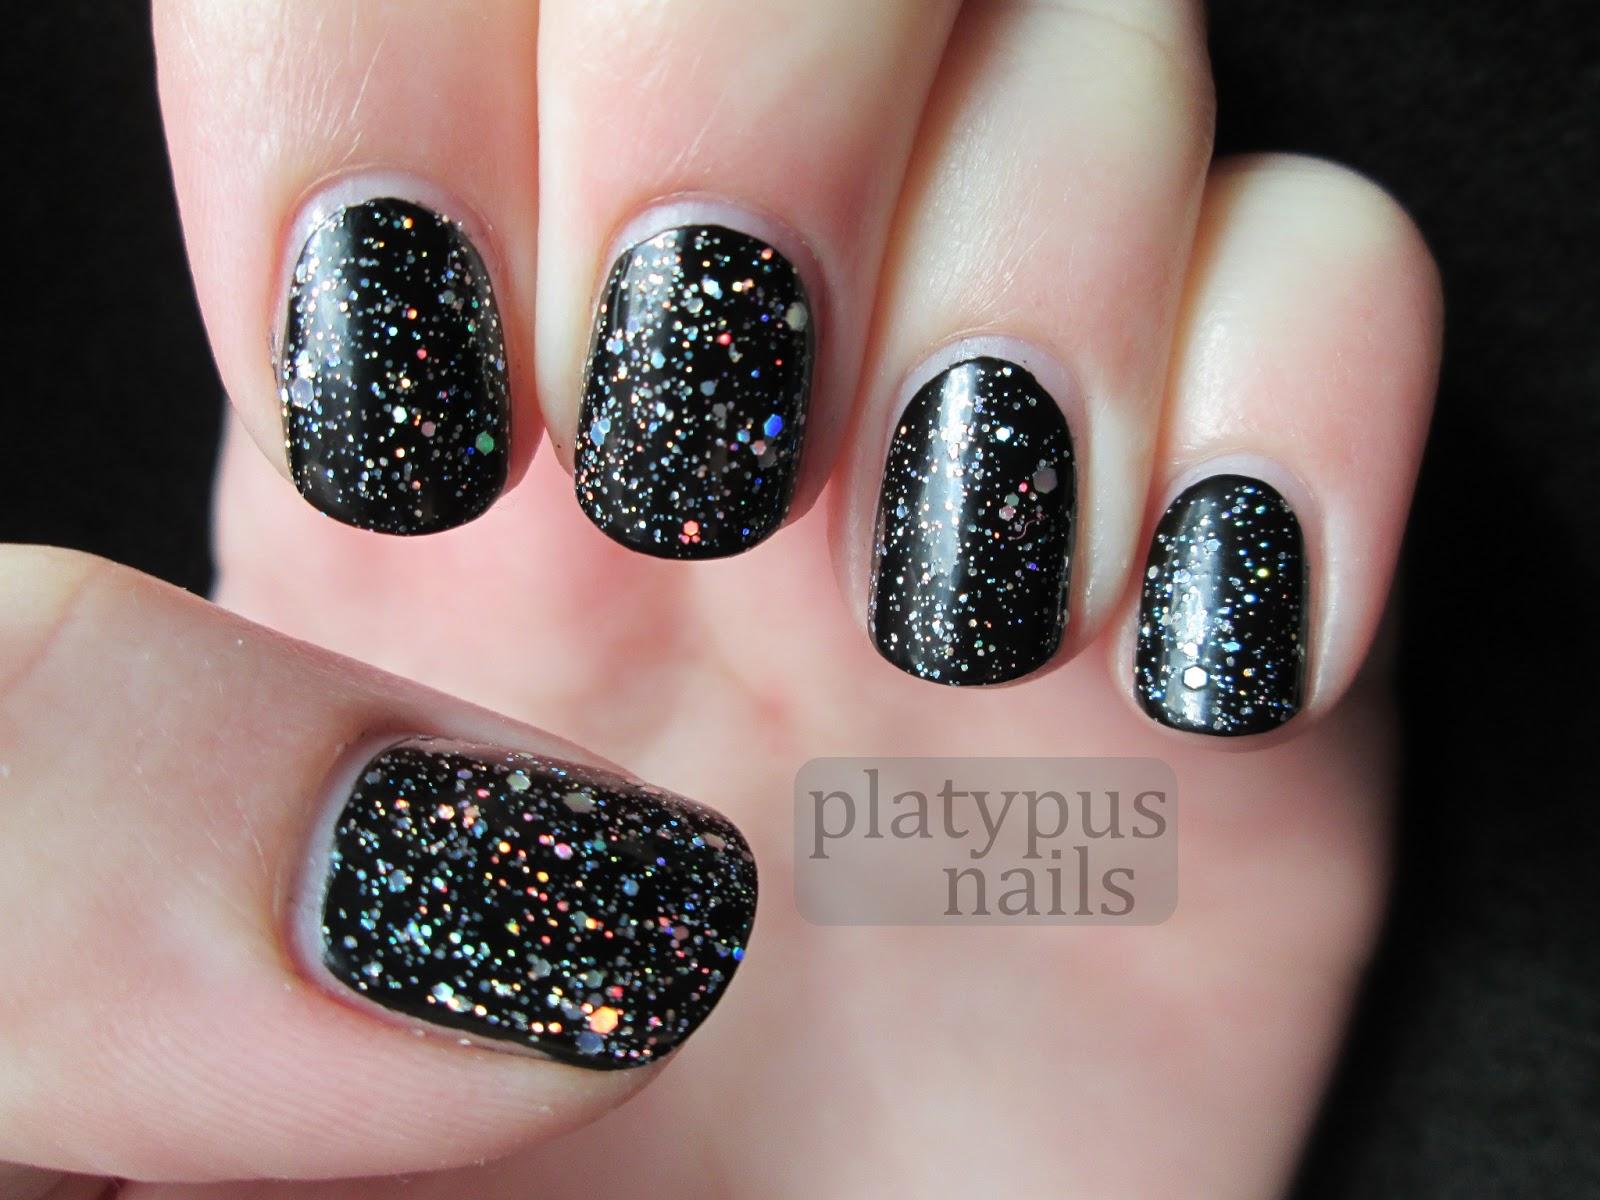 loonyplatypus: [nails] Barry M - Diamond Glitter